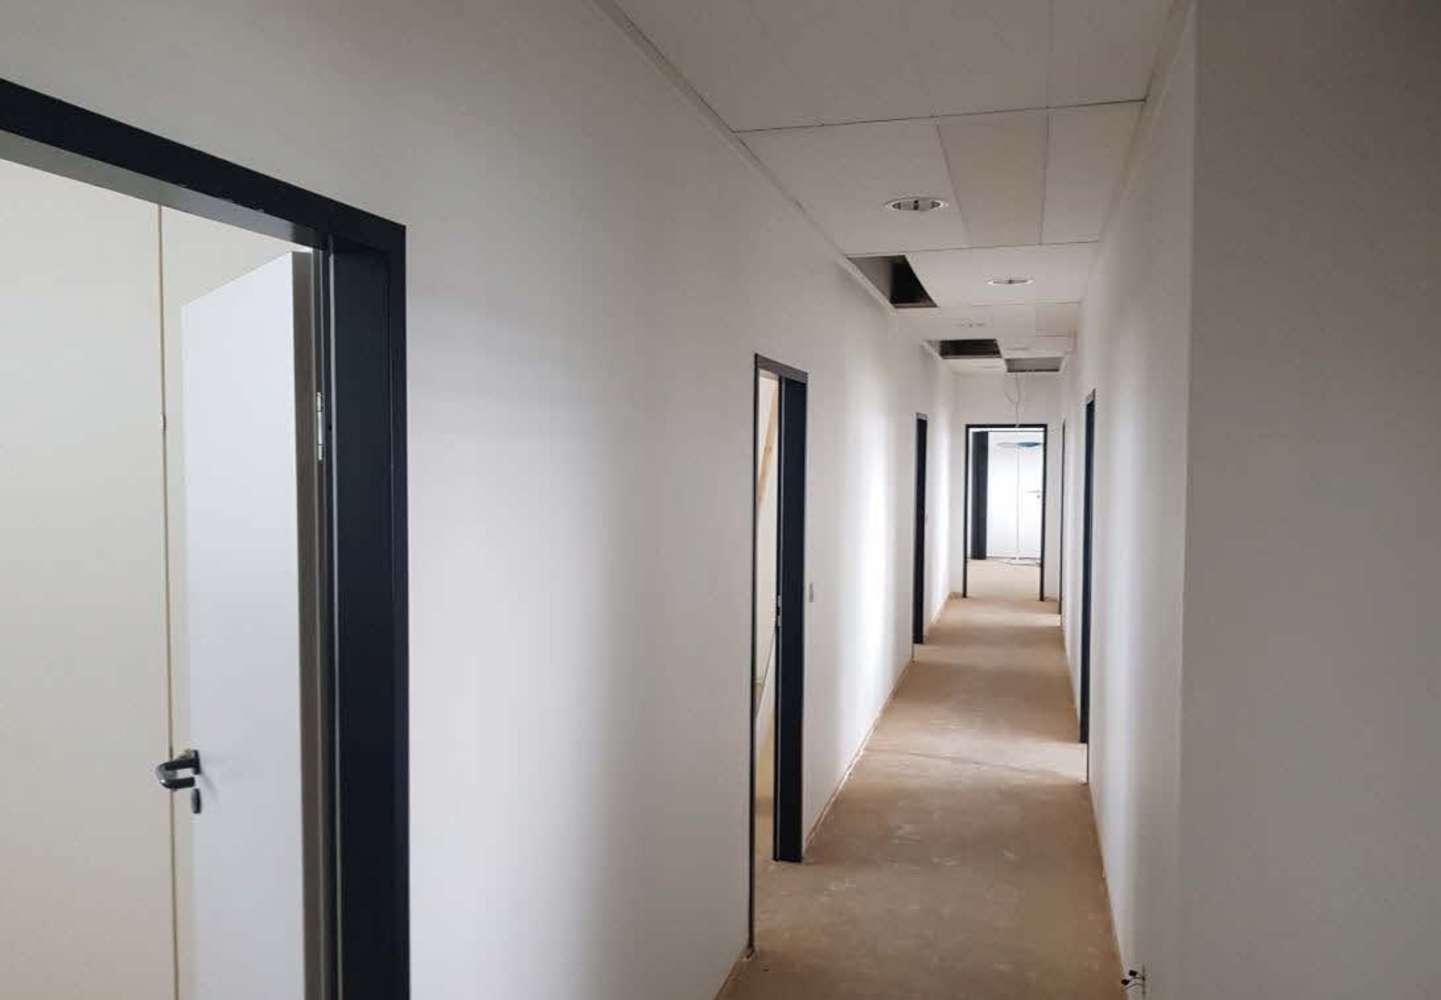 Büros Frankfurt am main, 60388 - Büro - Frankfurt am Main, Bergen-Enkheim - F1306 - 10008317